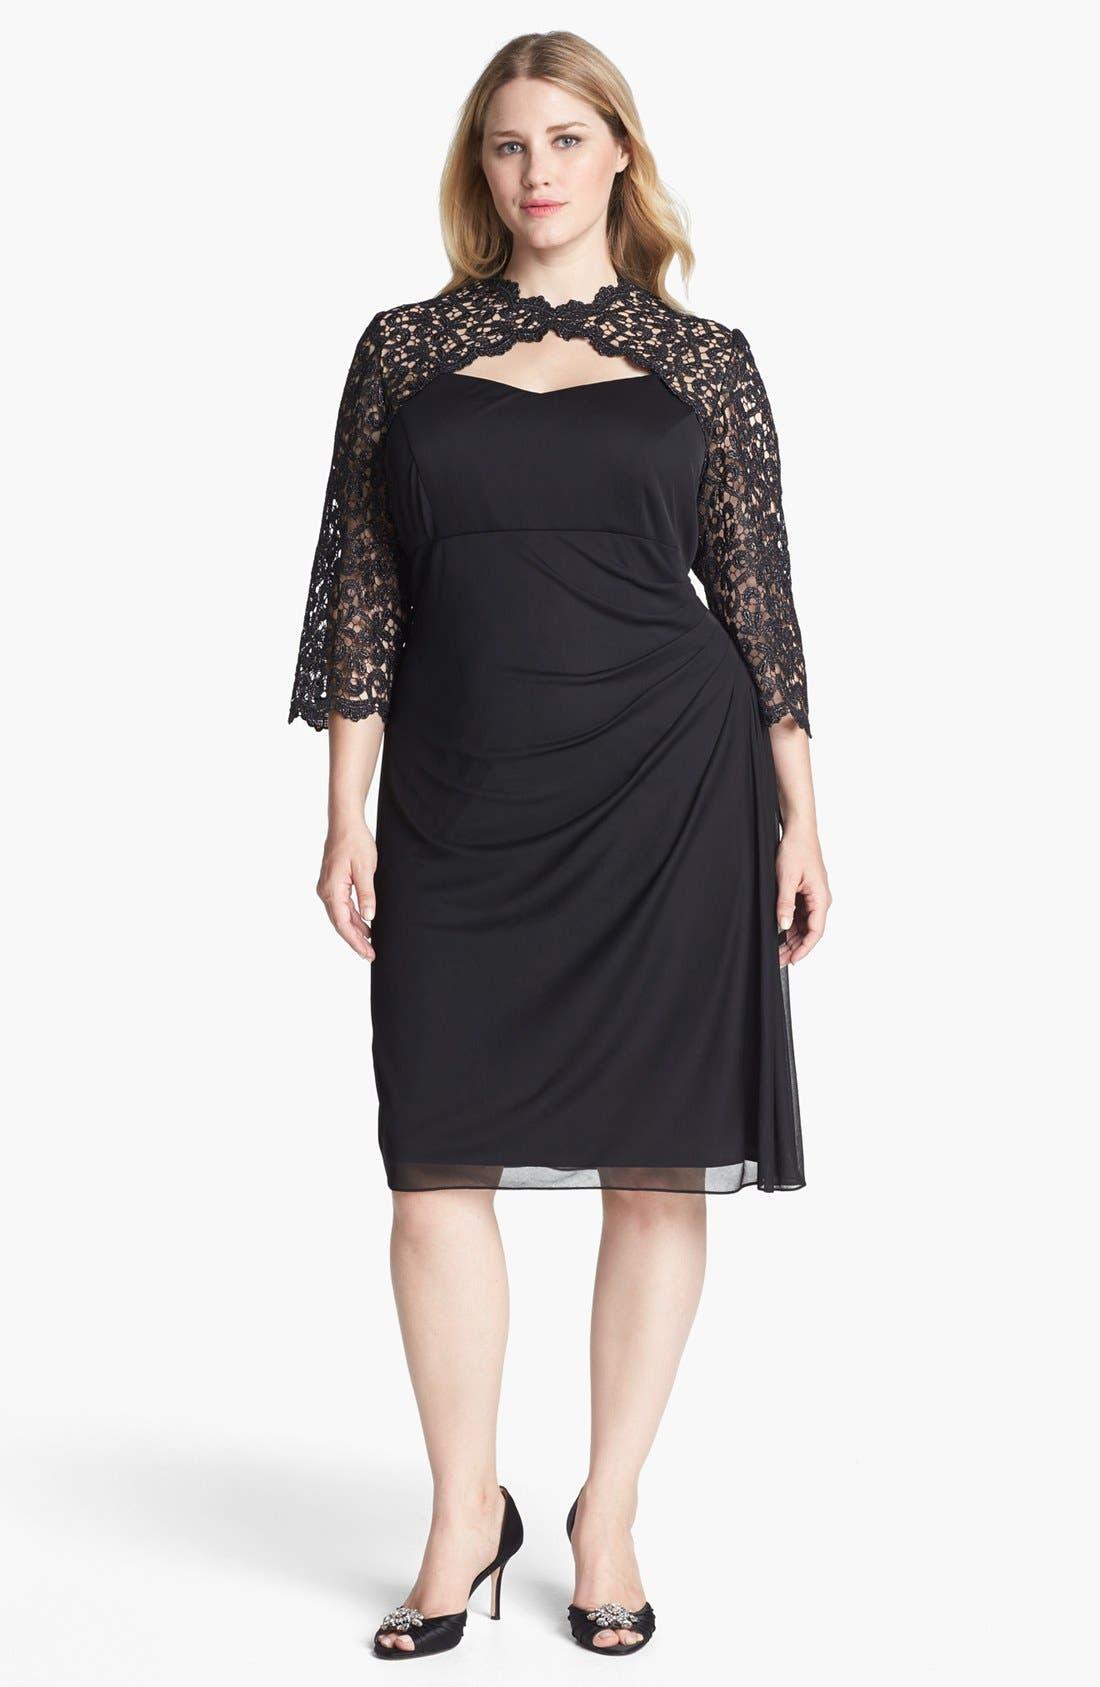 Alternate Image 1 Selected - Alex Evenings Lace Yoke Ruched Dress (Plus Size)